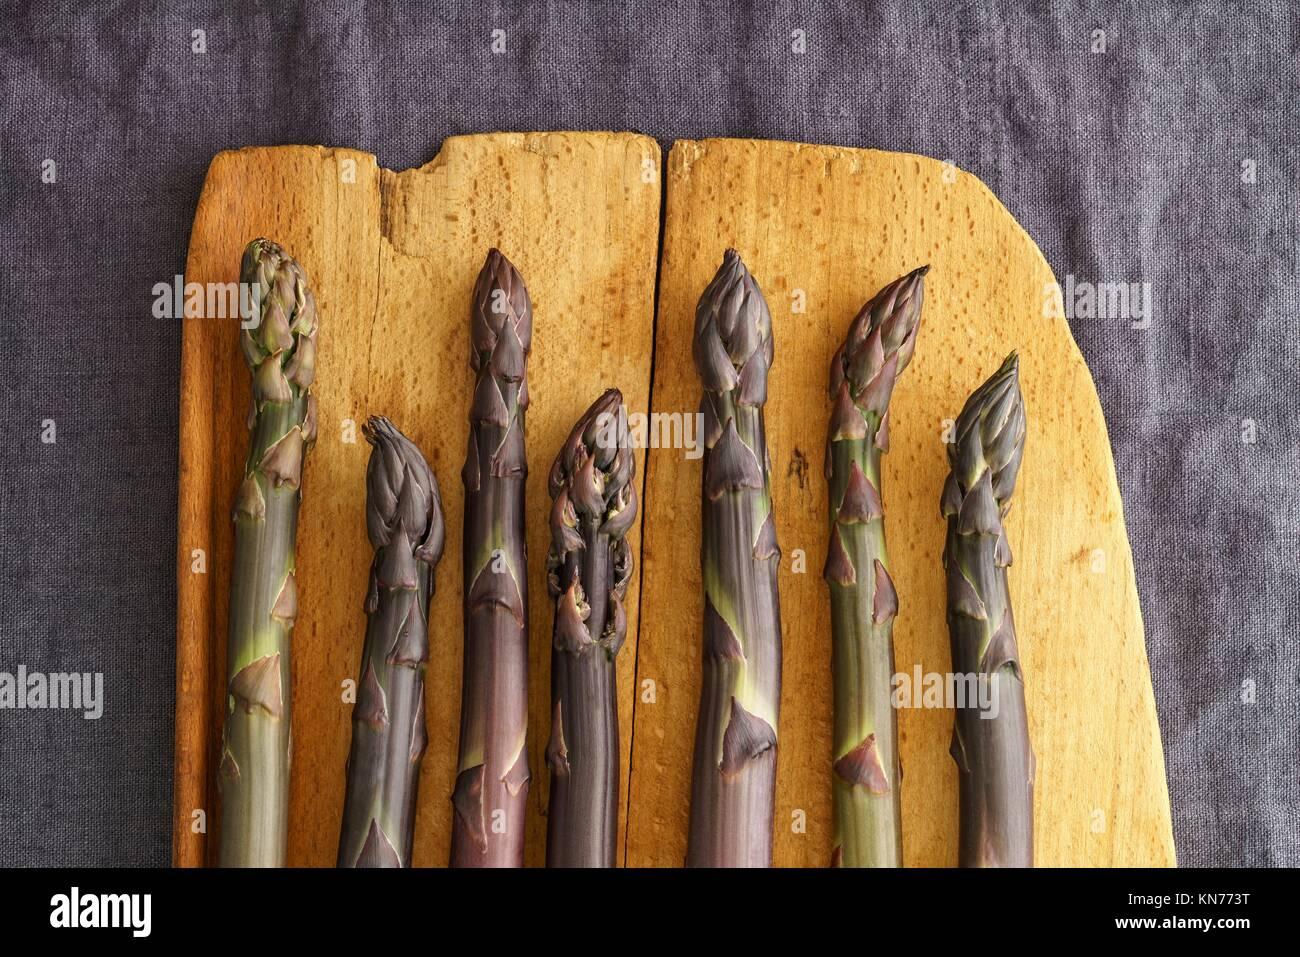 Fresh purple asparagus on vintage wooden baord on linen in dark moody light. - Stock Image